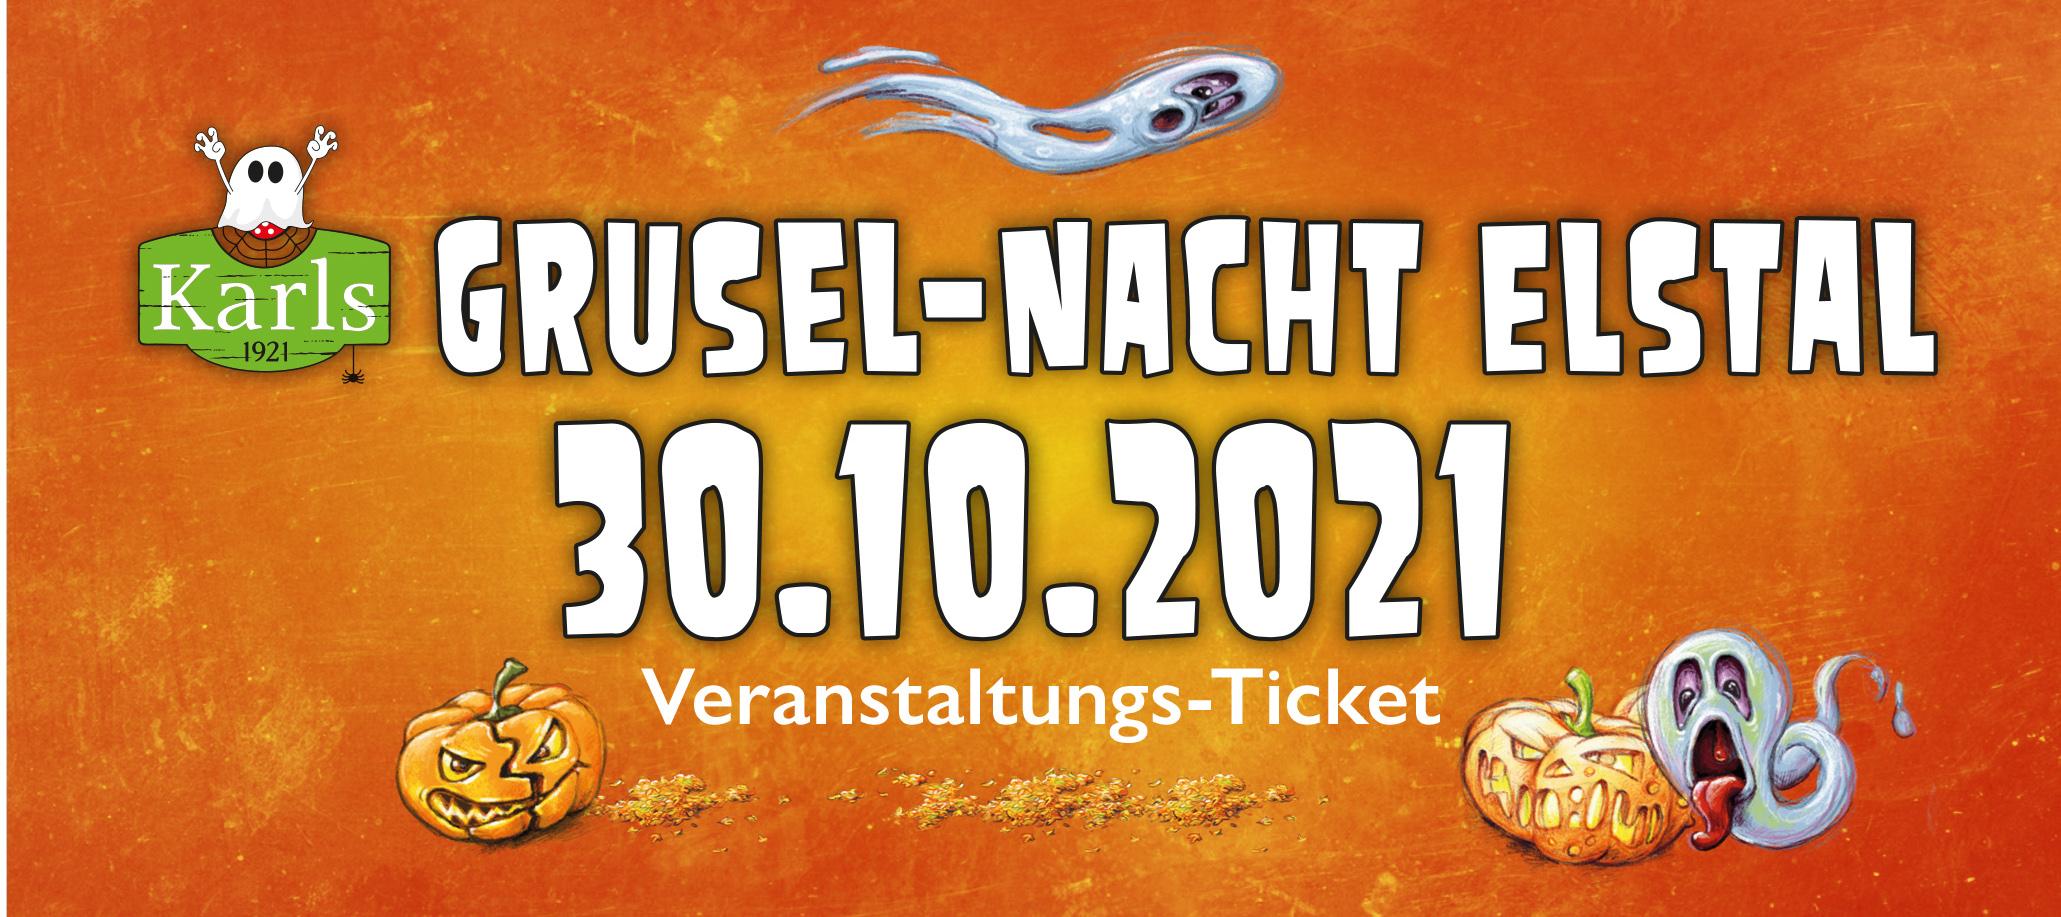 Grusel-Nacht Elstal  30.10.2021 - ruckzuck per Mail